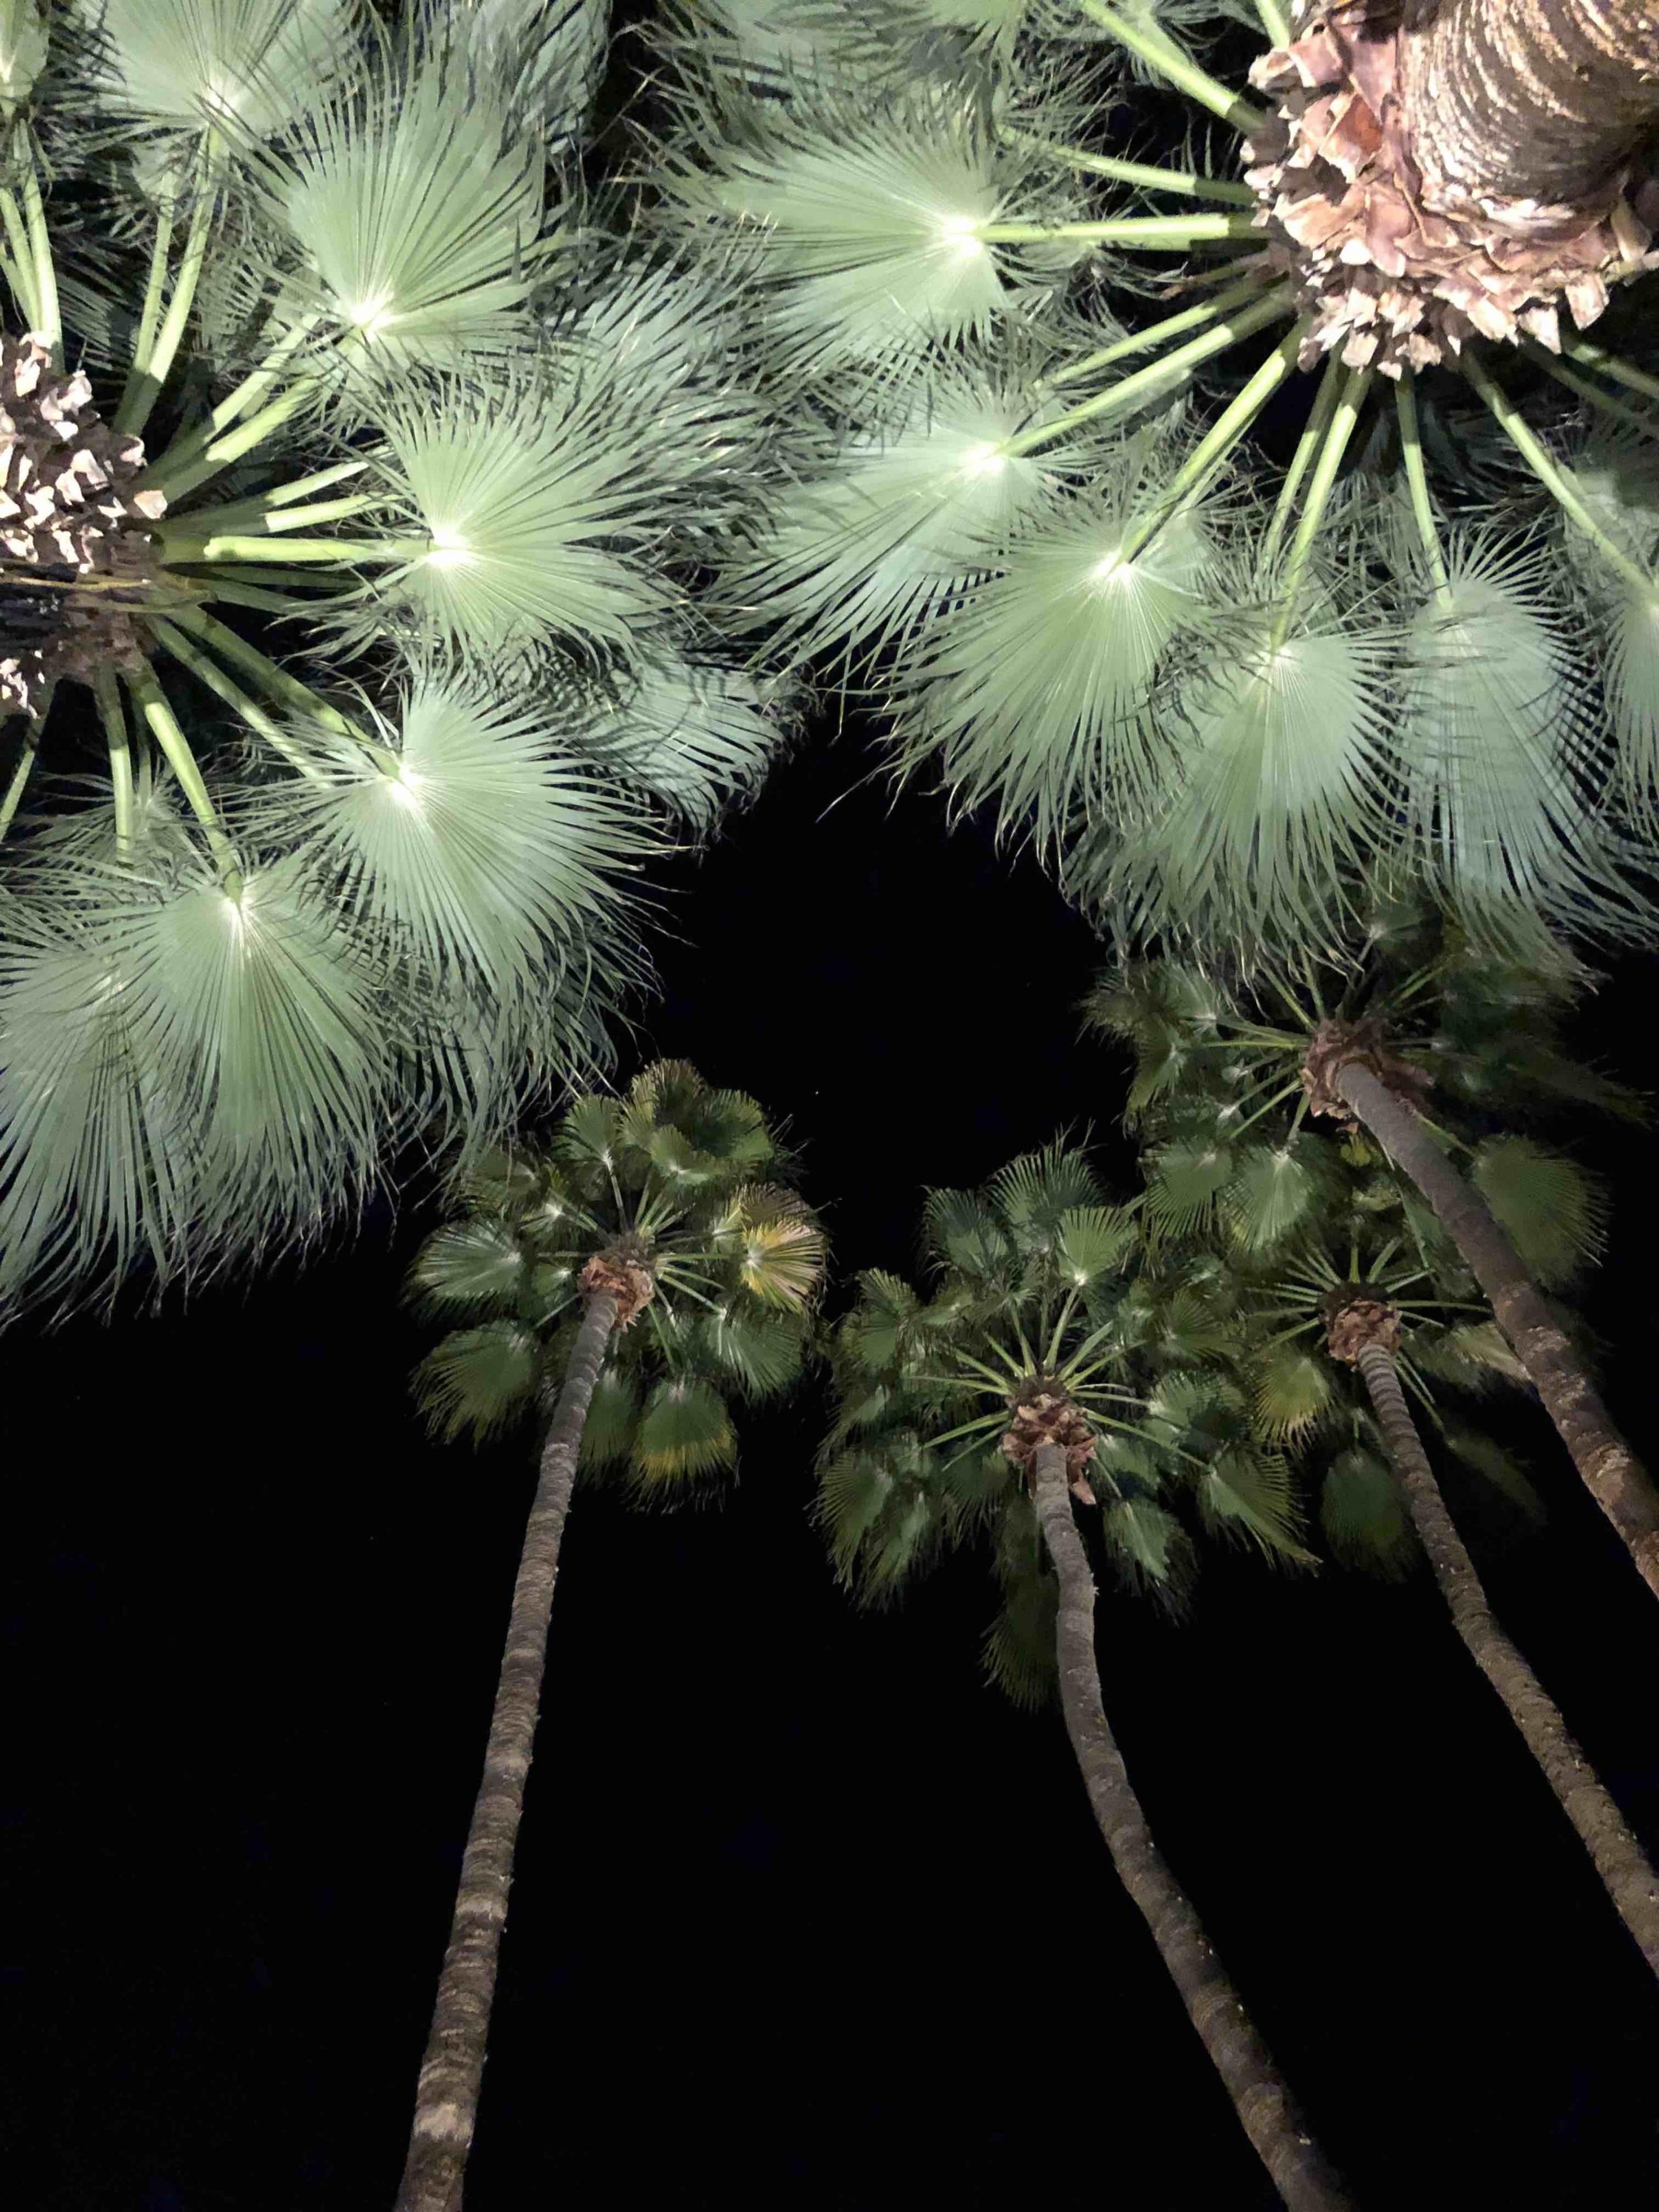 Tahquitz River Estates, Palm Springs, California, United States of America